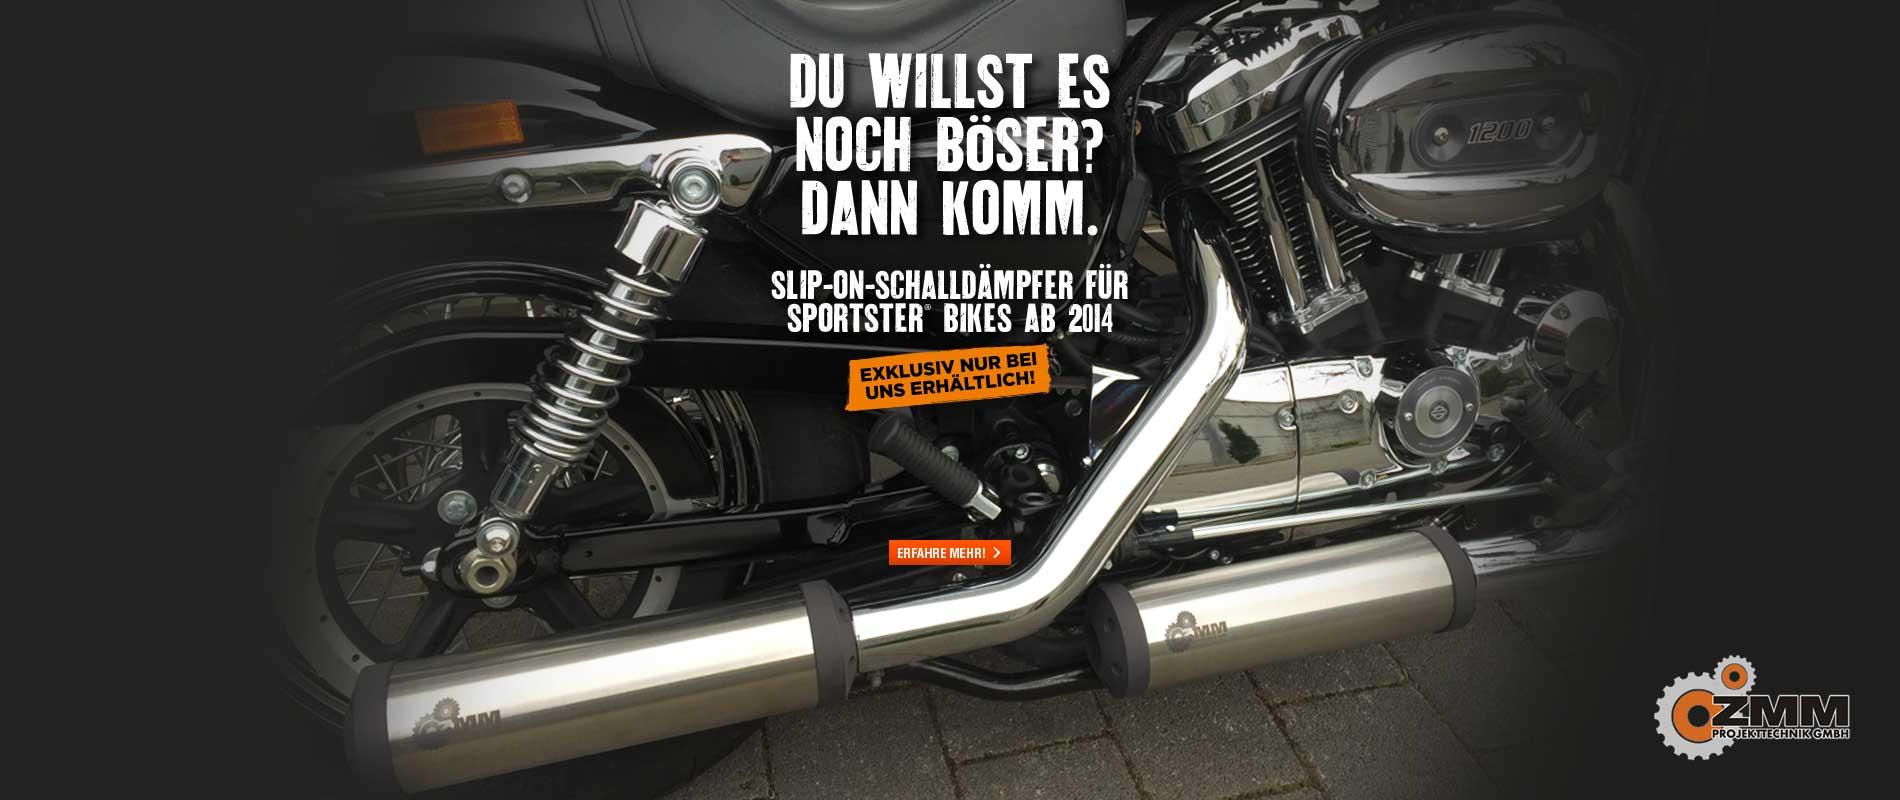 HD_Schwarzach_Billboard_SliponAuspuff